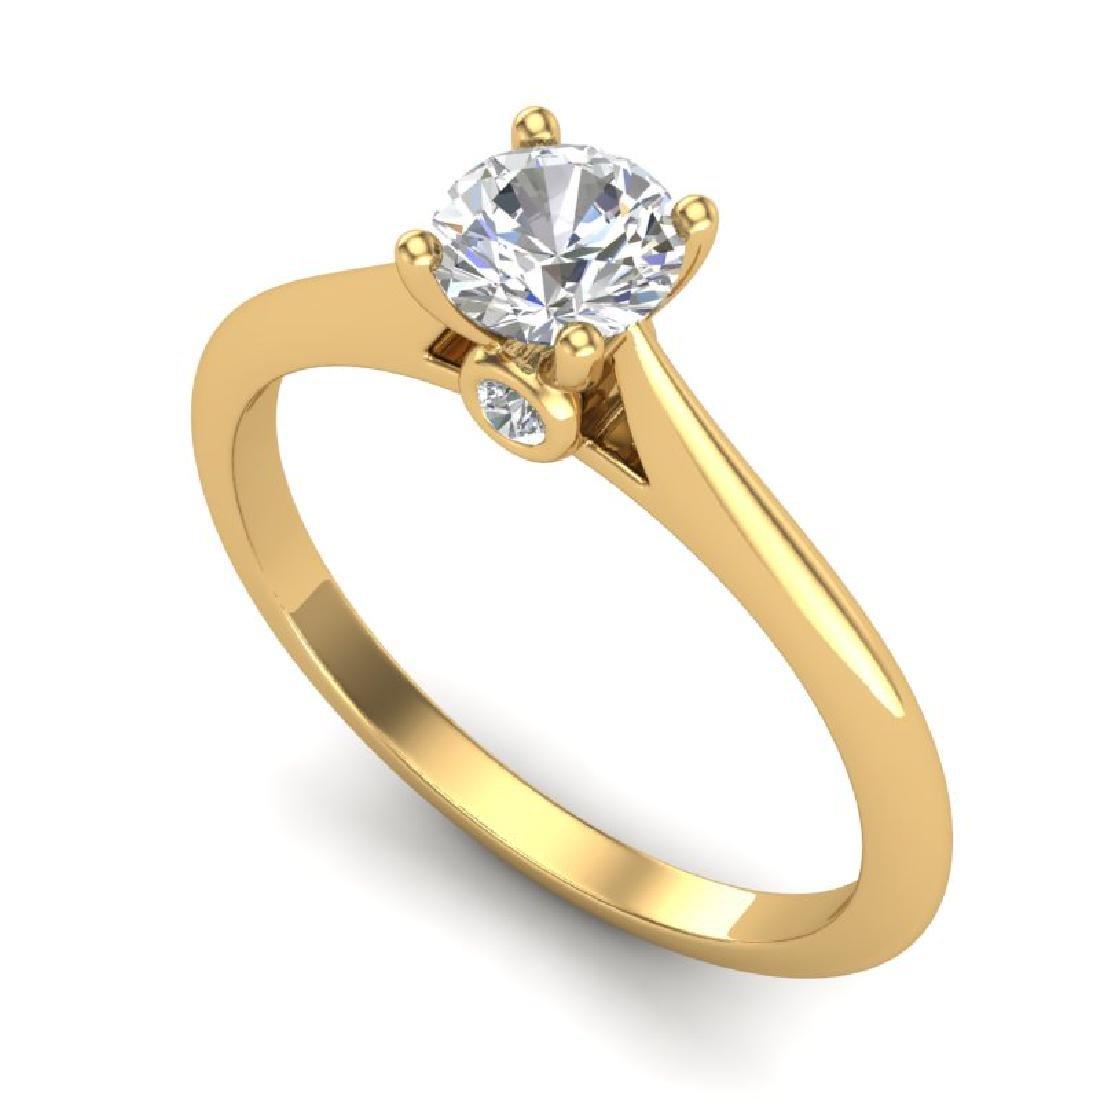 0.56 CTW VS/SI Diamond Solitaire Art Deco Ring 18K